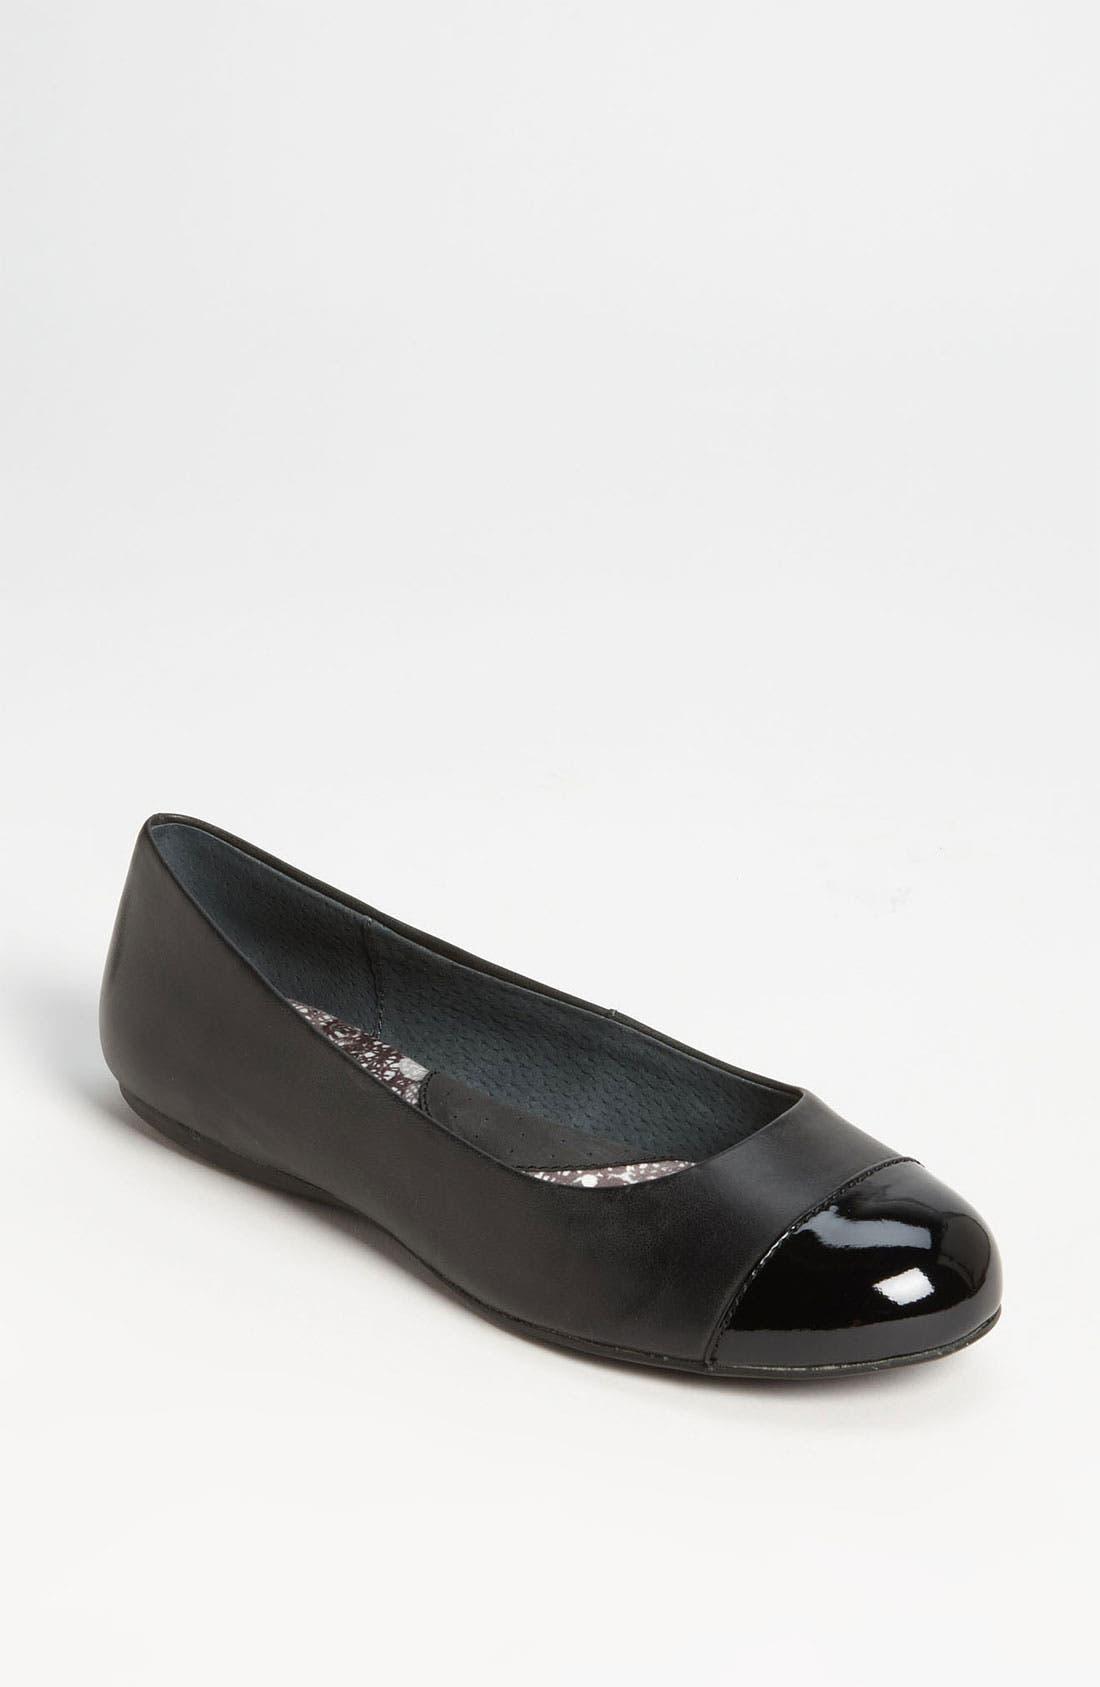 'Napa' Flat,                         Main,                         color, BLACK LEATHER